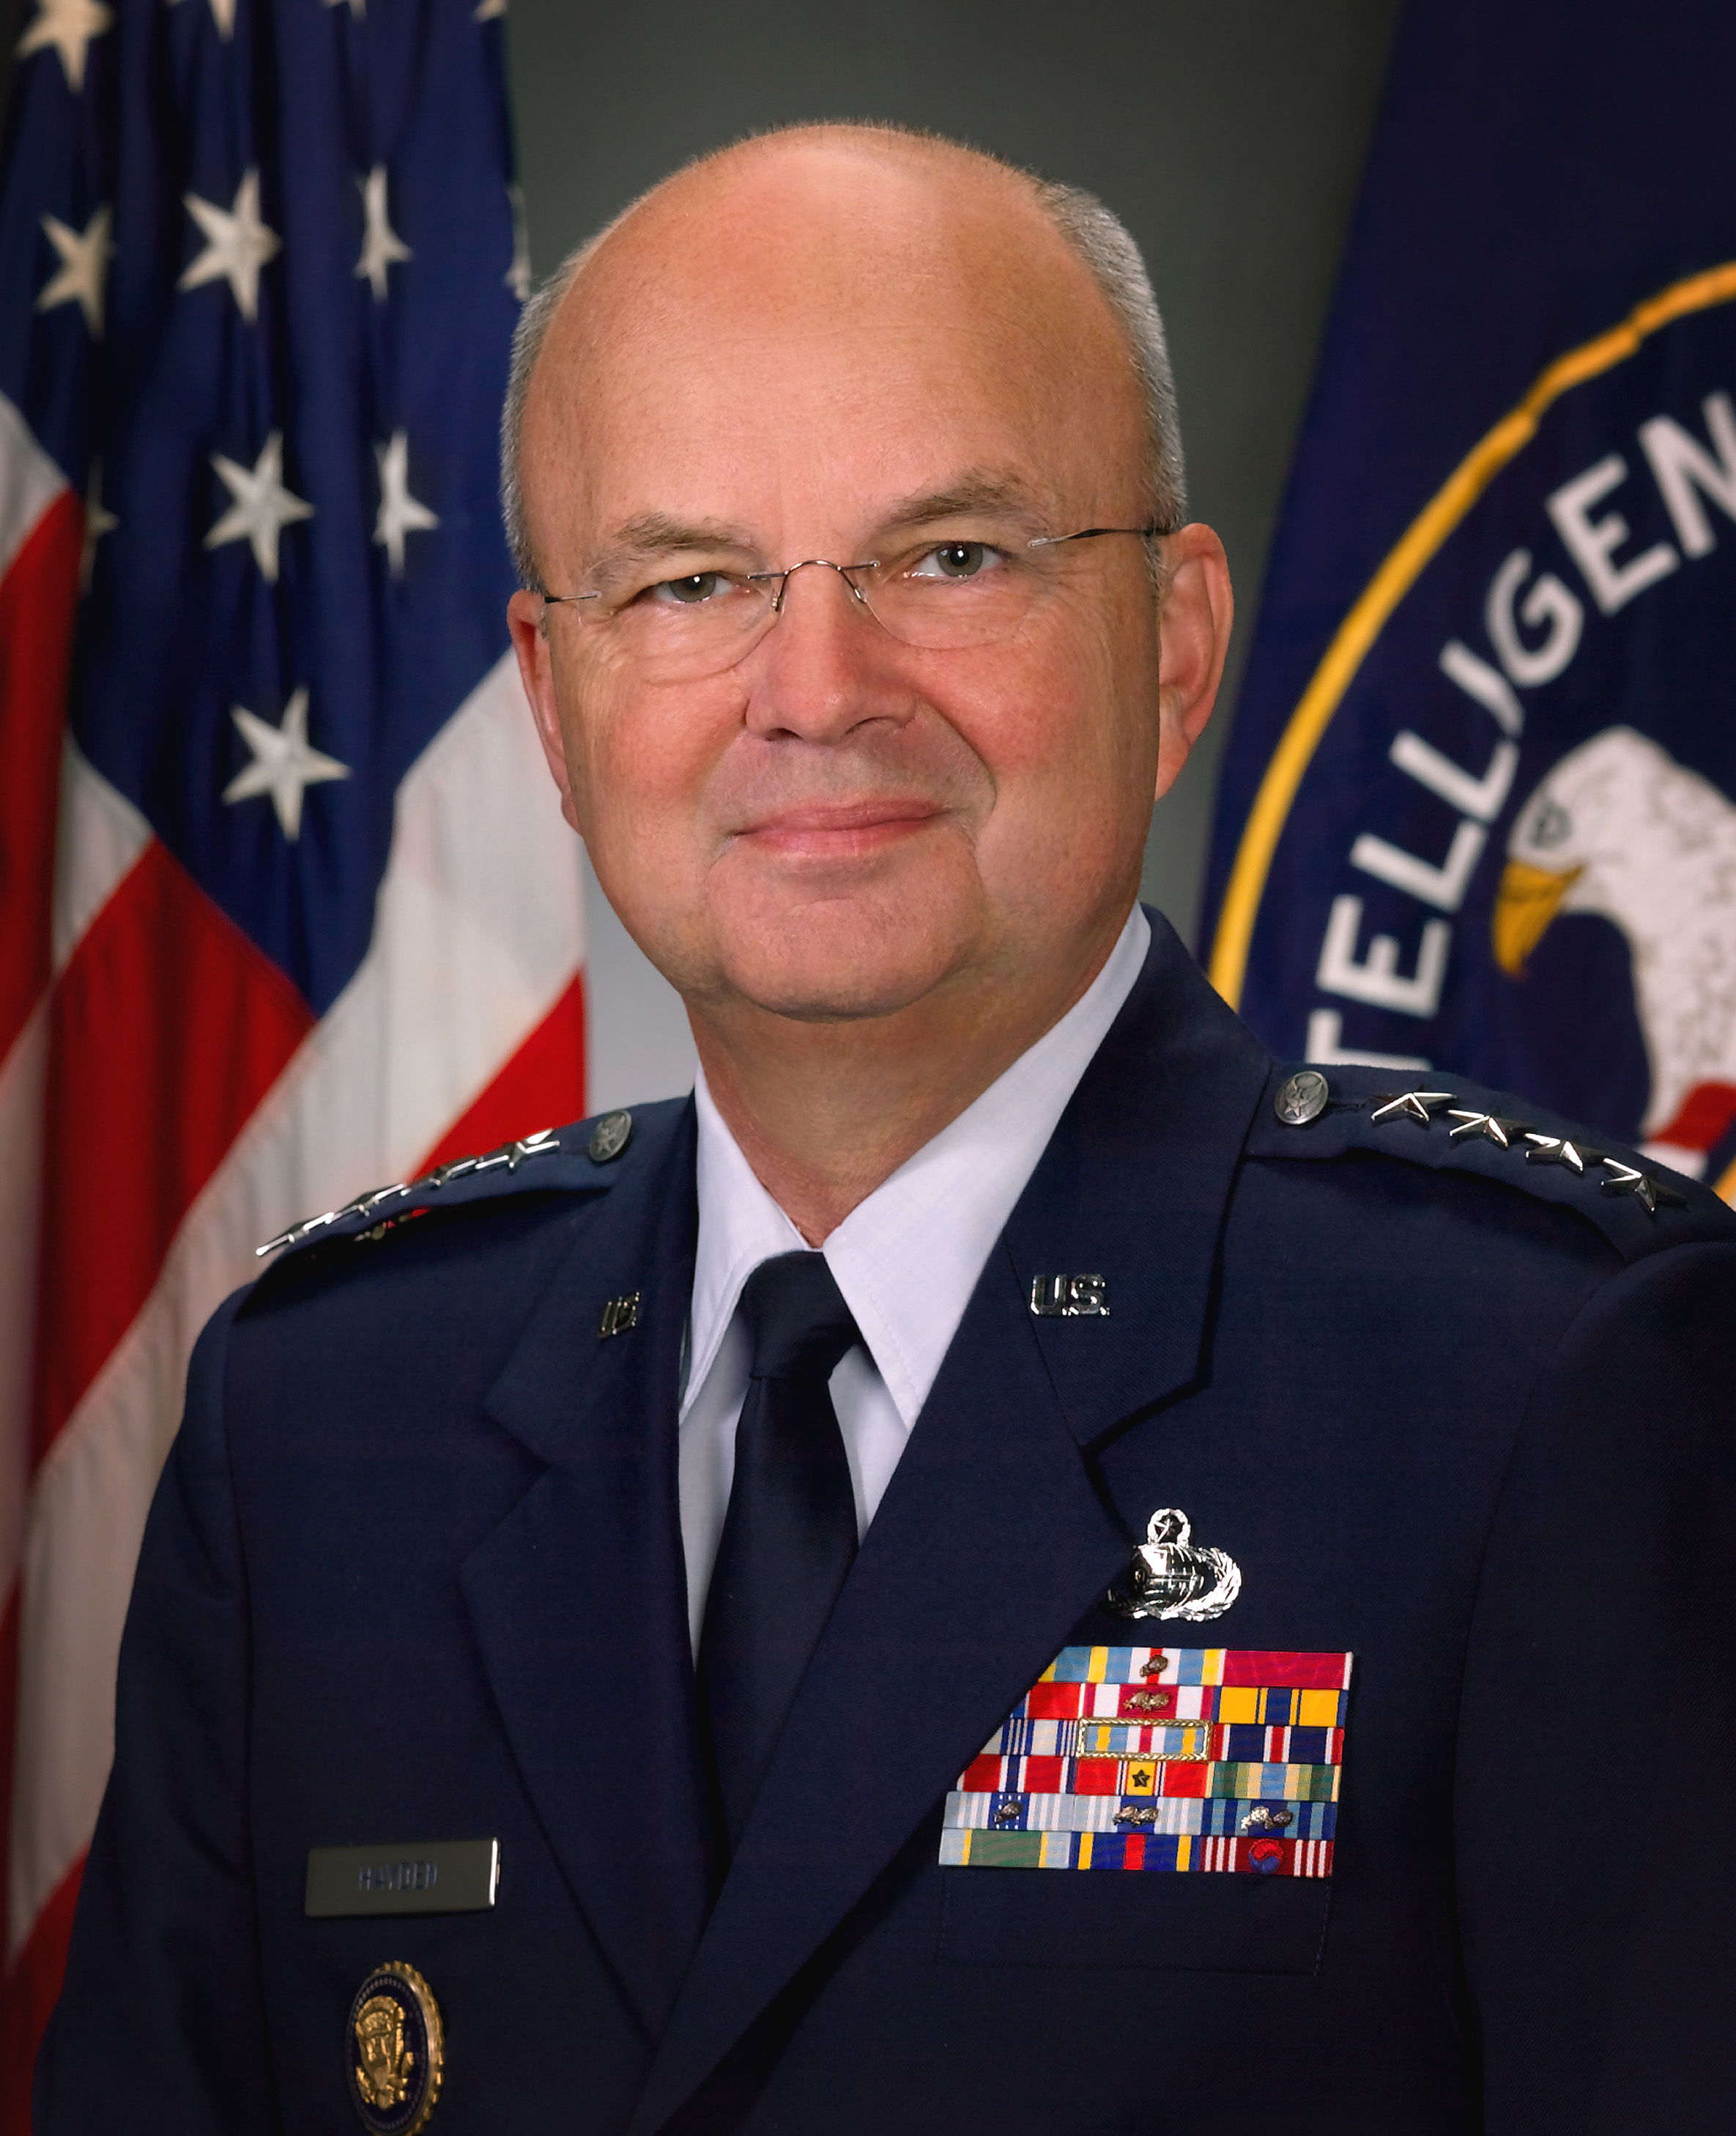 general michael v hayden u s air force biography display